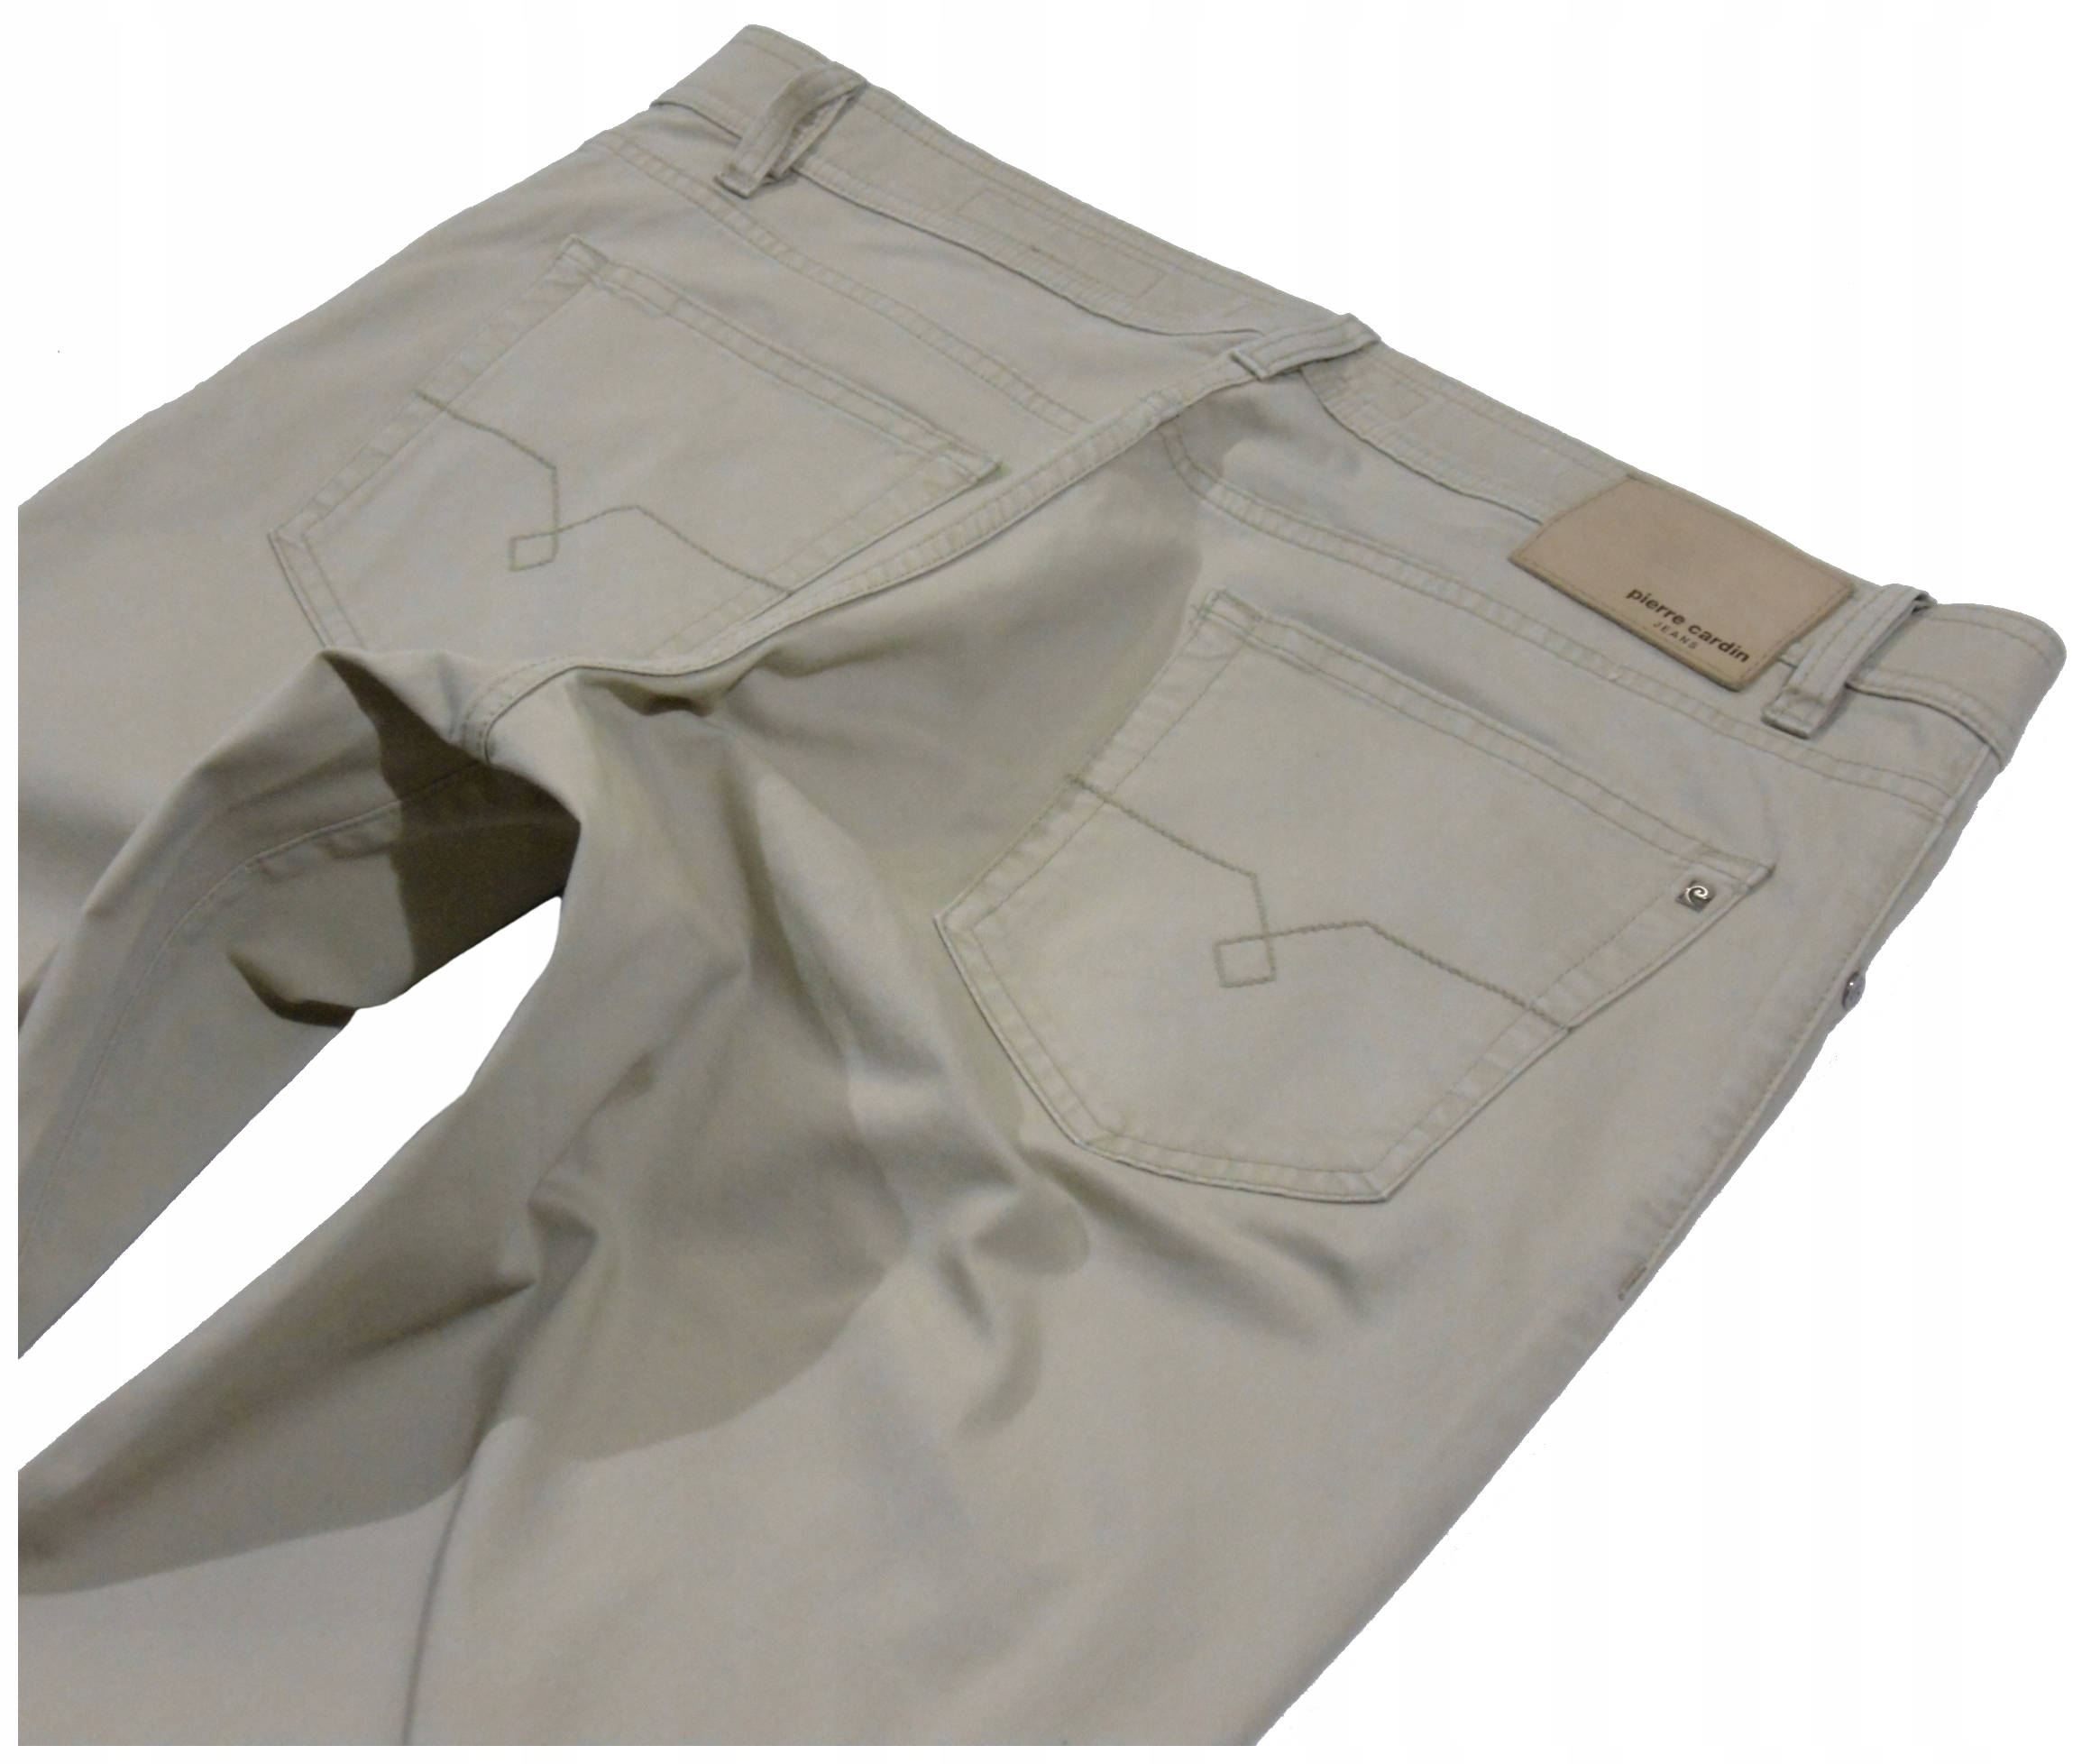 PIERRE CARDIN DEAUVILLE _ Spodnie _ 40/32 _Pas 100